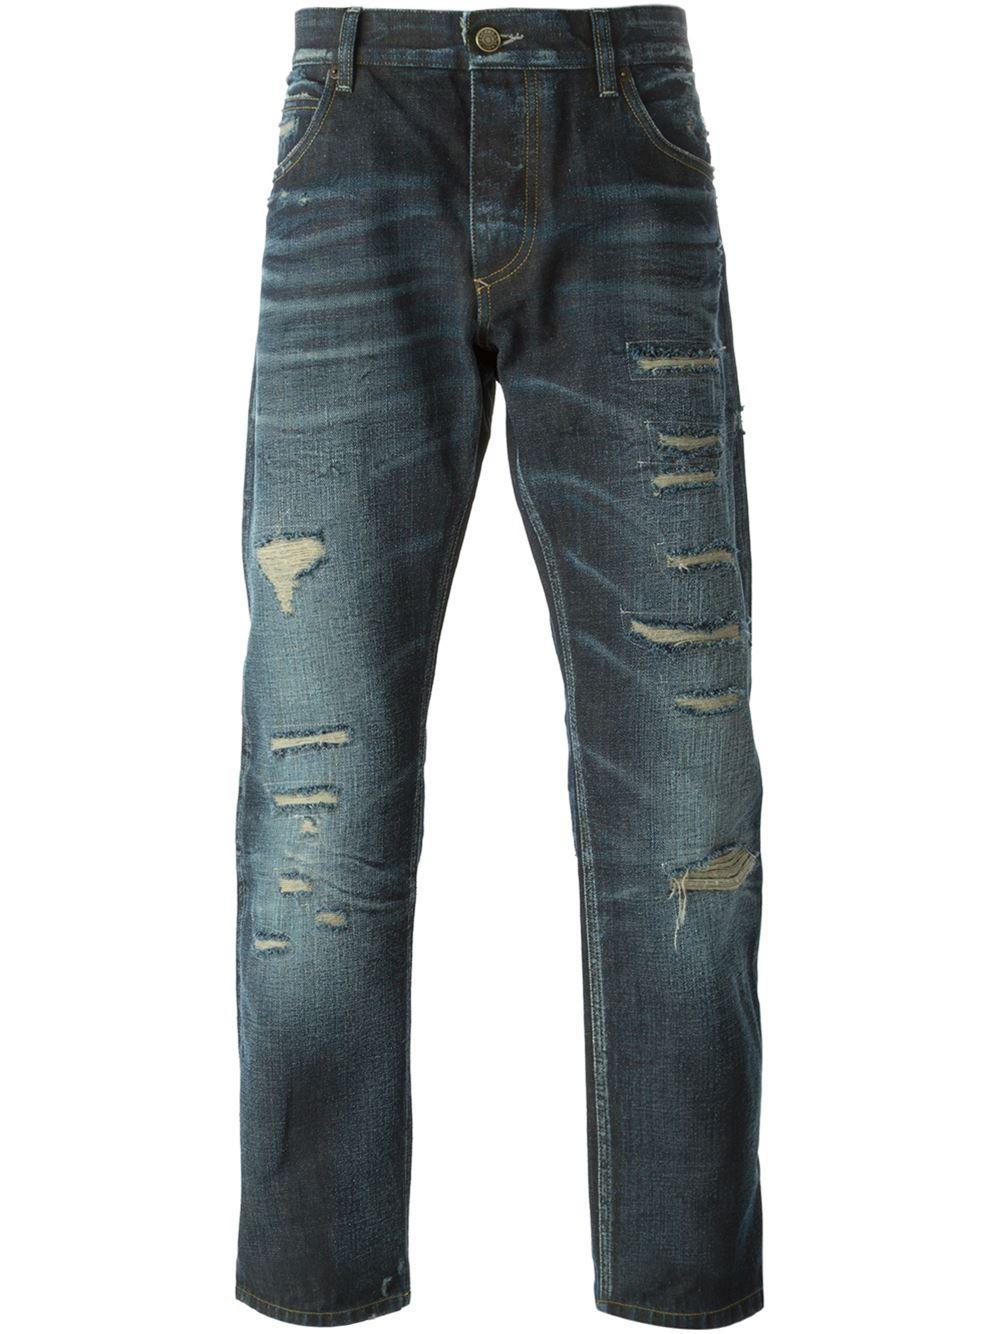 dolce gabbana ripped jeans in blue for men lyst. Black Bedroom Furniture Sets. Home Design Ideas